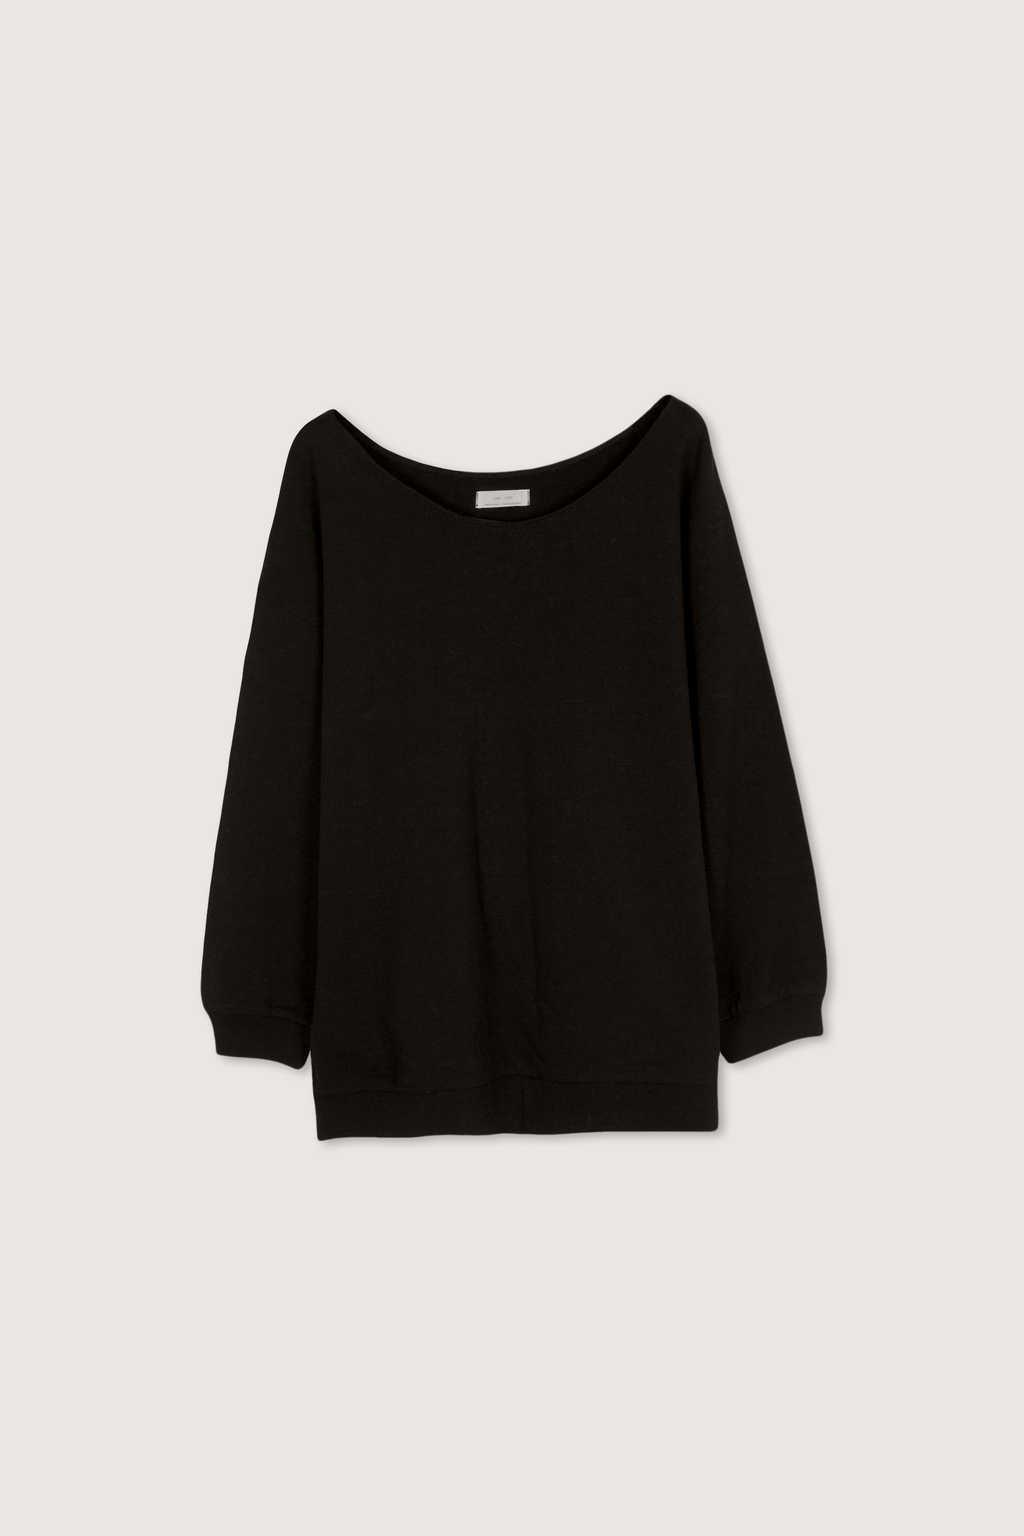 Sweatshirt 1950 Black 11